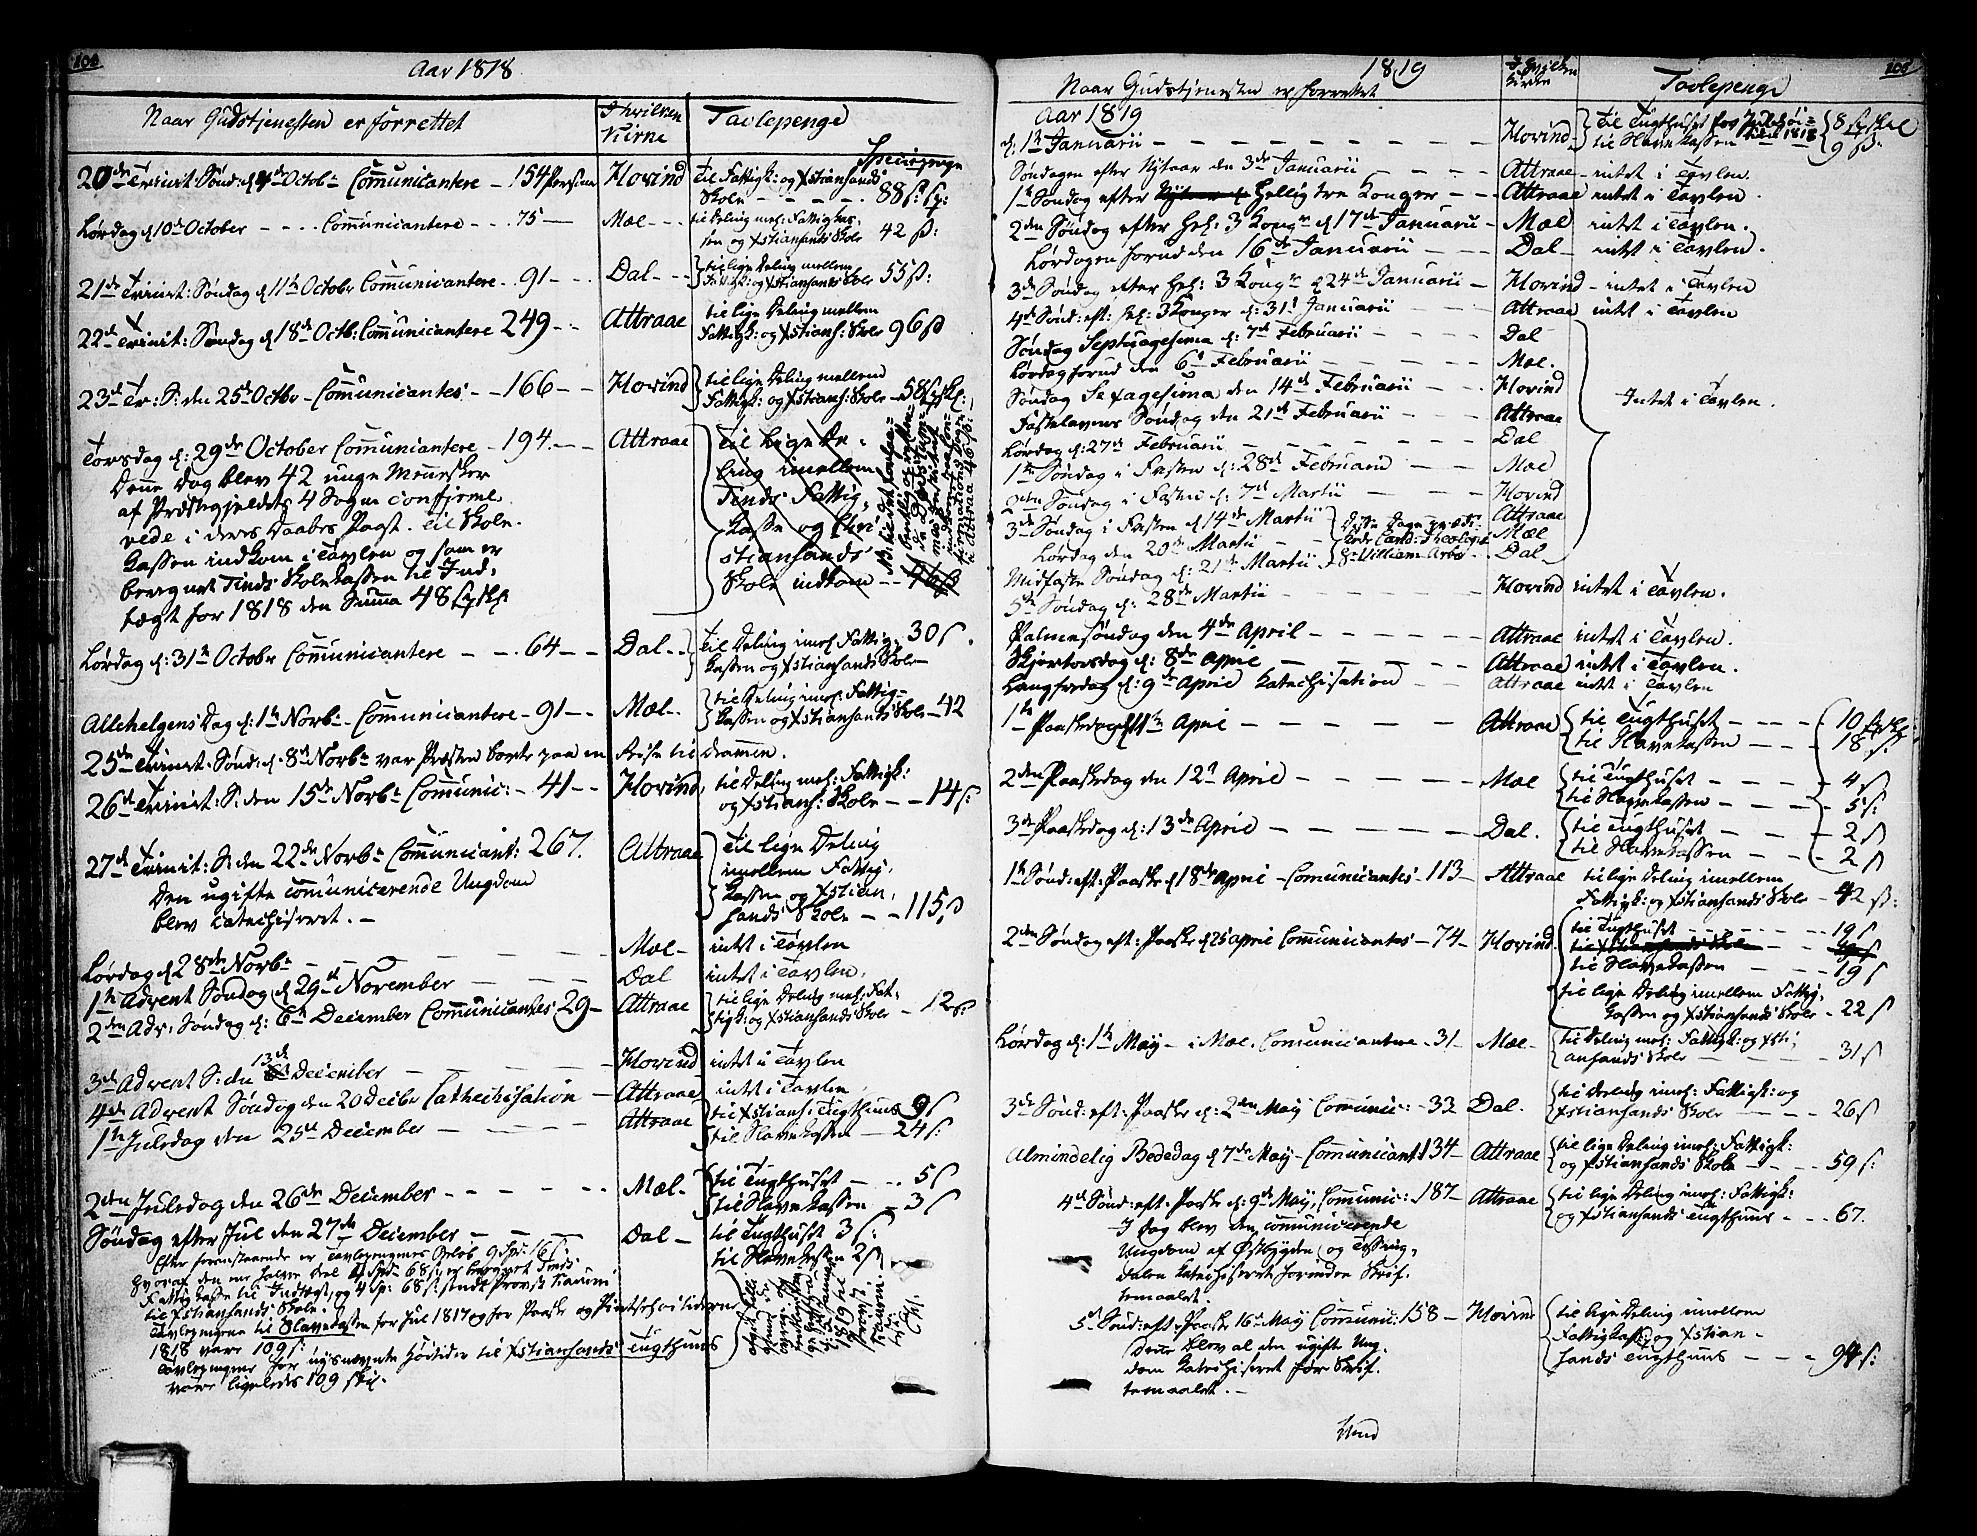 SAKO, Tinn kirkebøker, F/Fa/L0003: Ministerialbok nr. I 3, 1810-1814, s. 104-105